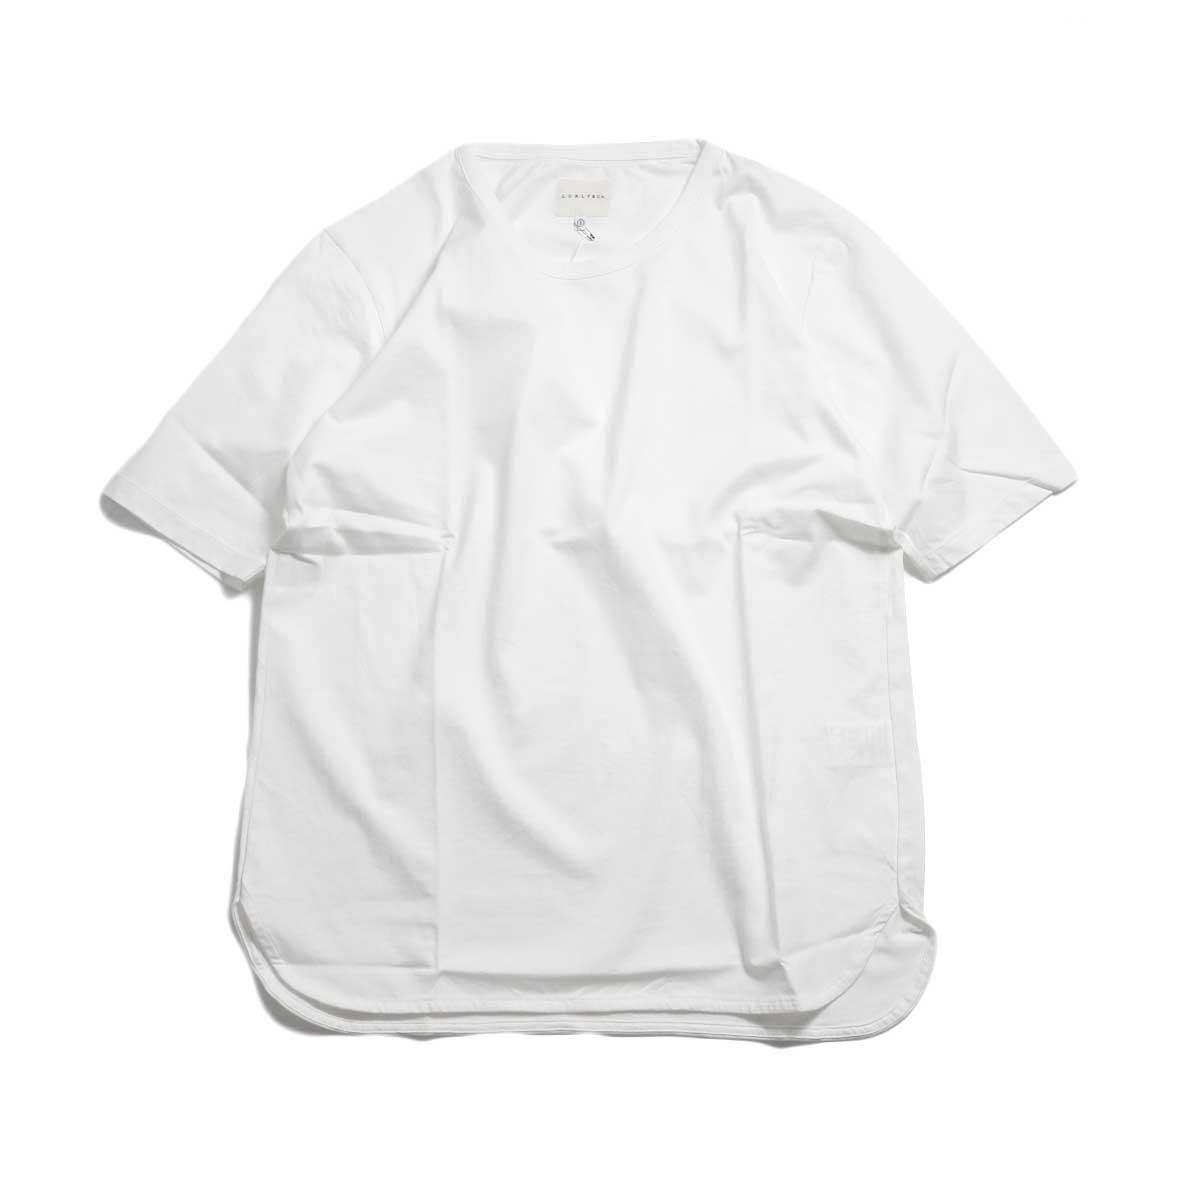 CURLY / SDH HS CN TEE -White